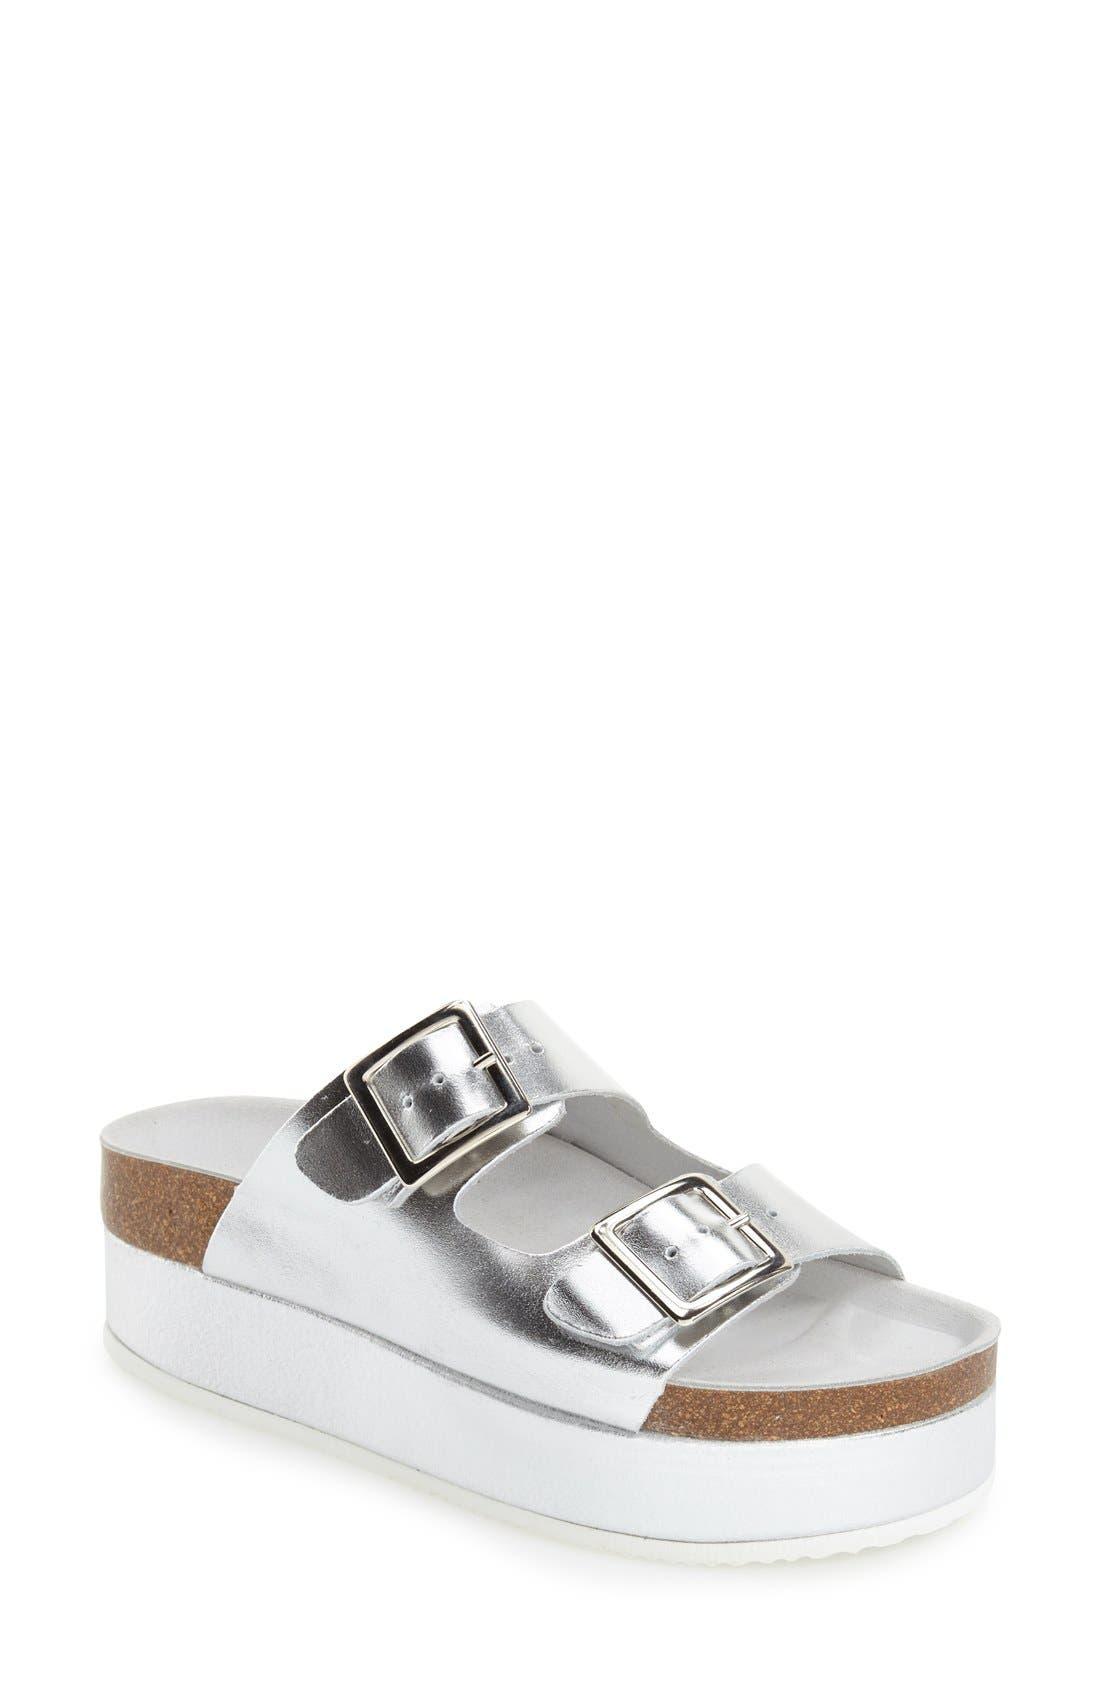 Alternate Image 1 Selected - Topshop 'Fang' Platform Sandal (Women)